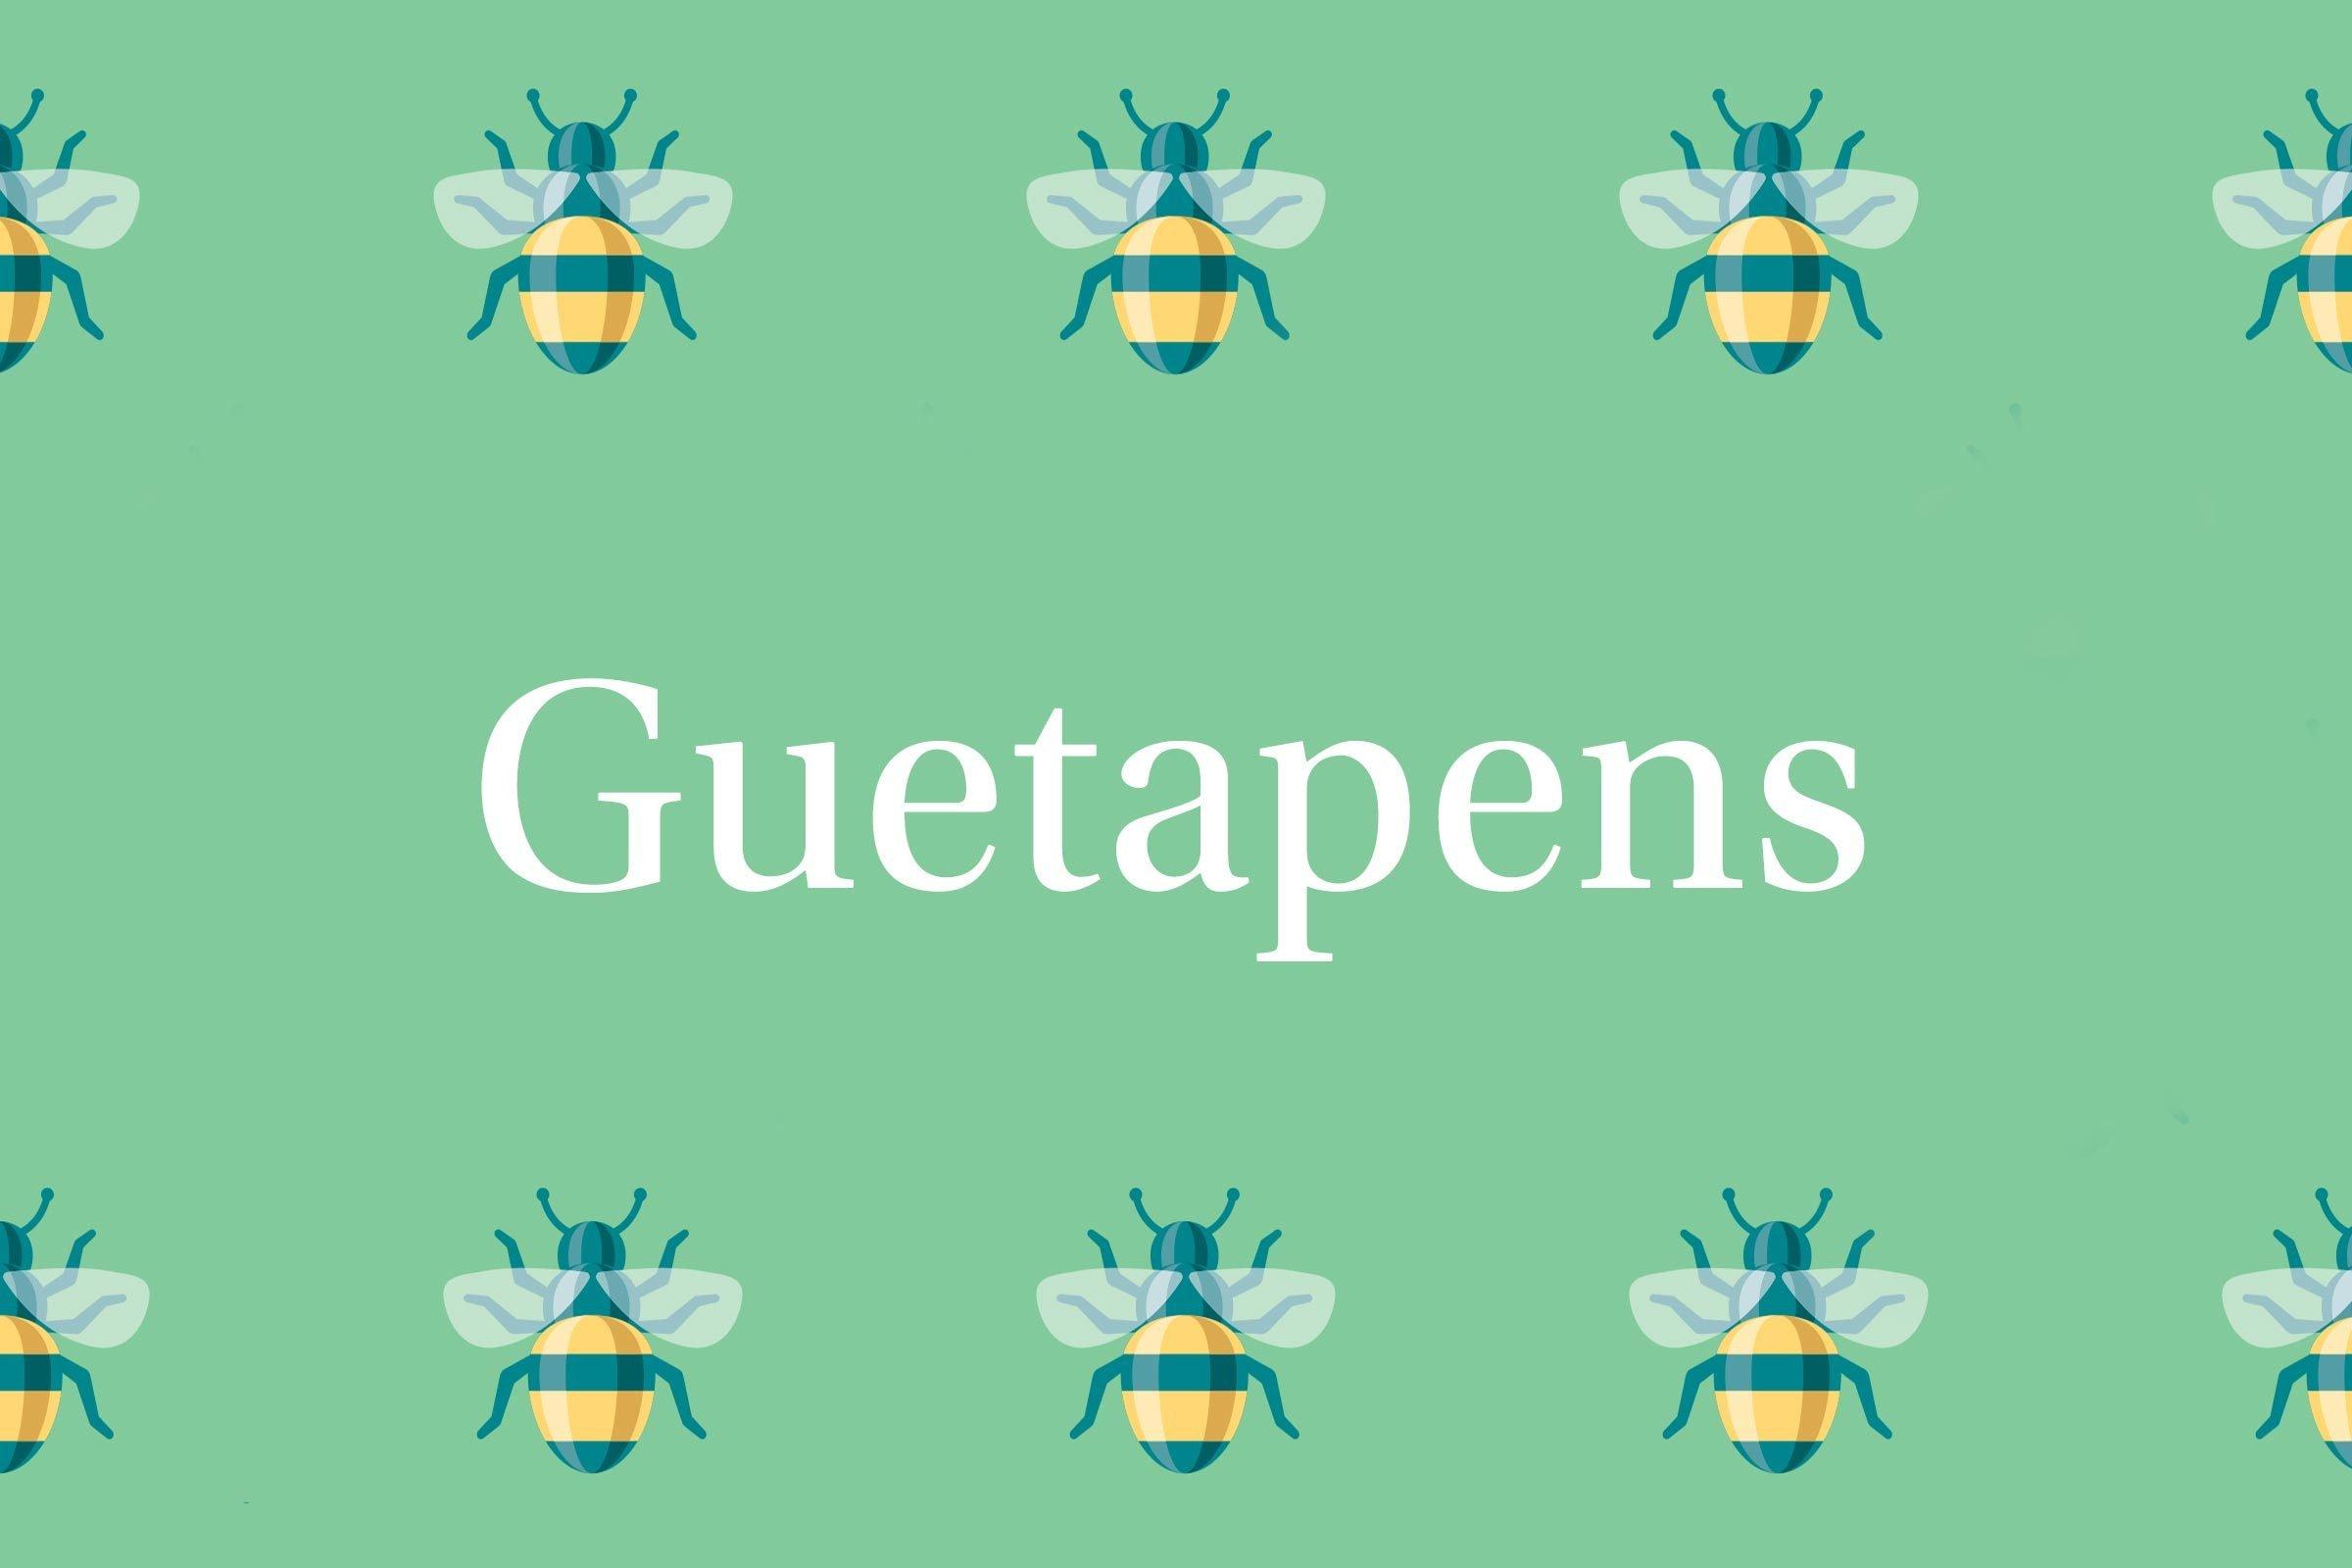 Guetapens